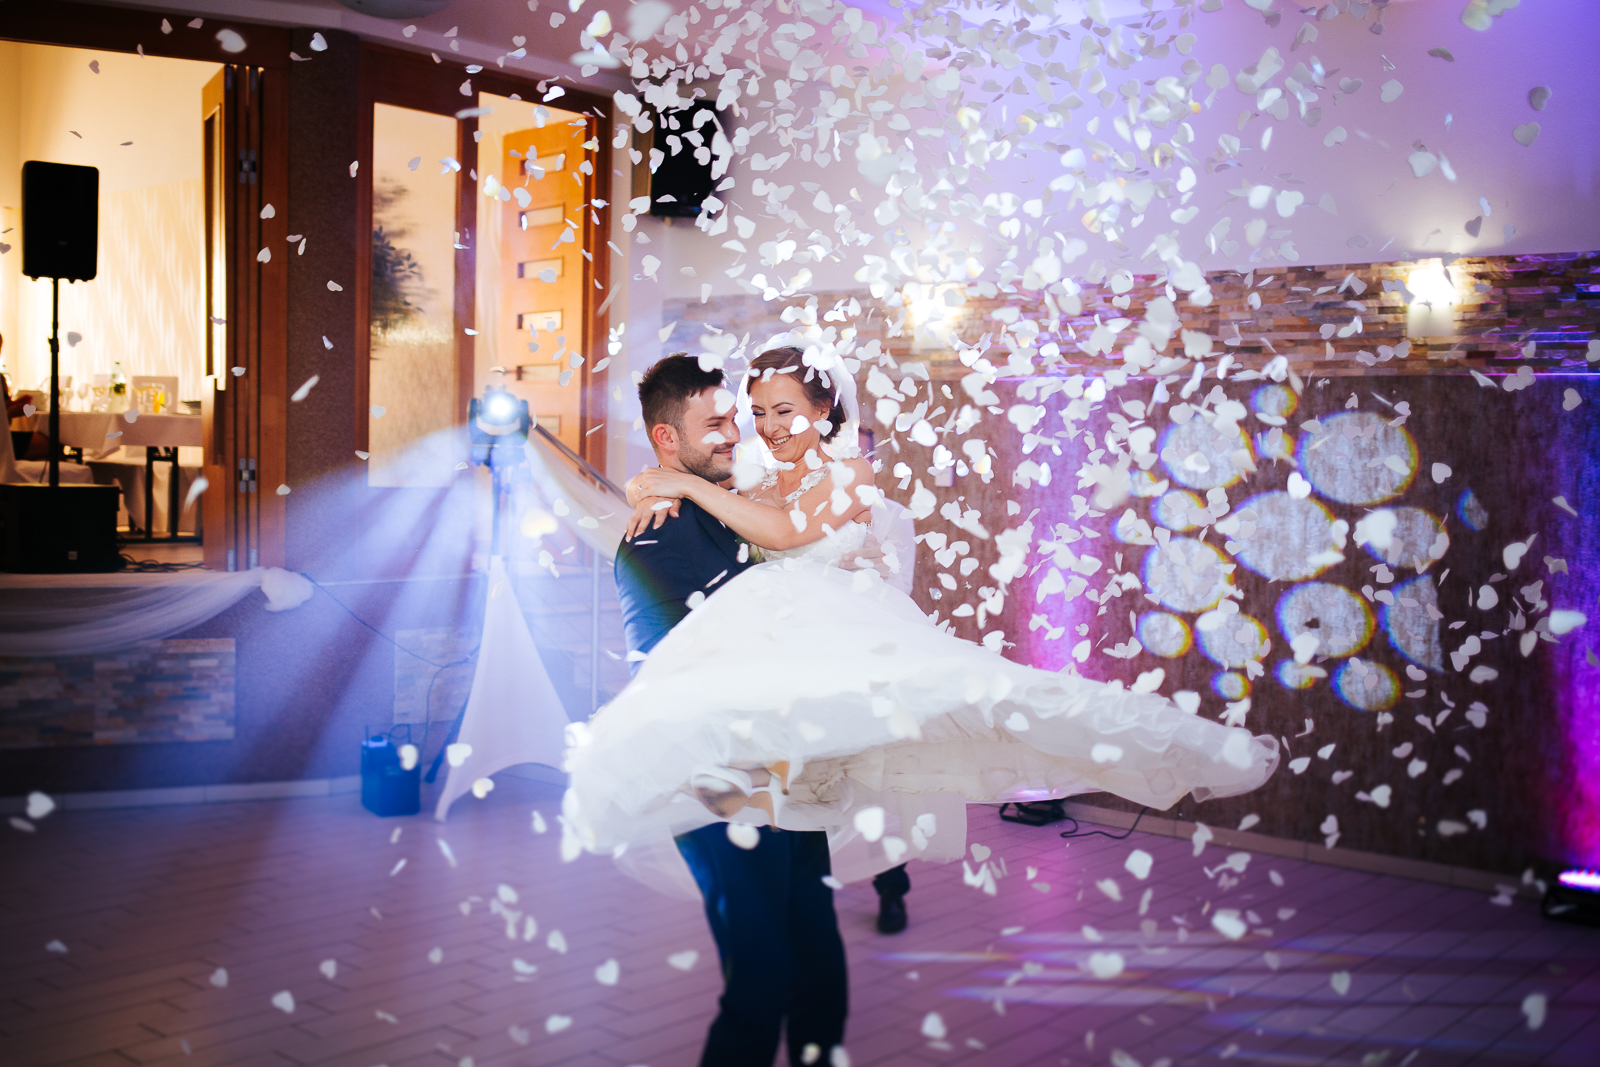 Svadba Lednické Rovne, KMK Restaurant 01 #svadobnyDJ, #djanasvadbu, #svadba, #svadbalednickerovne #lednickerovne